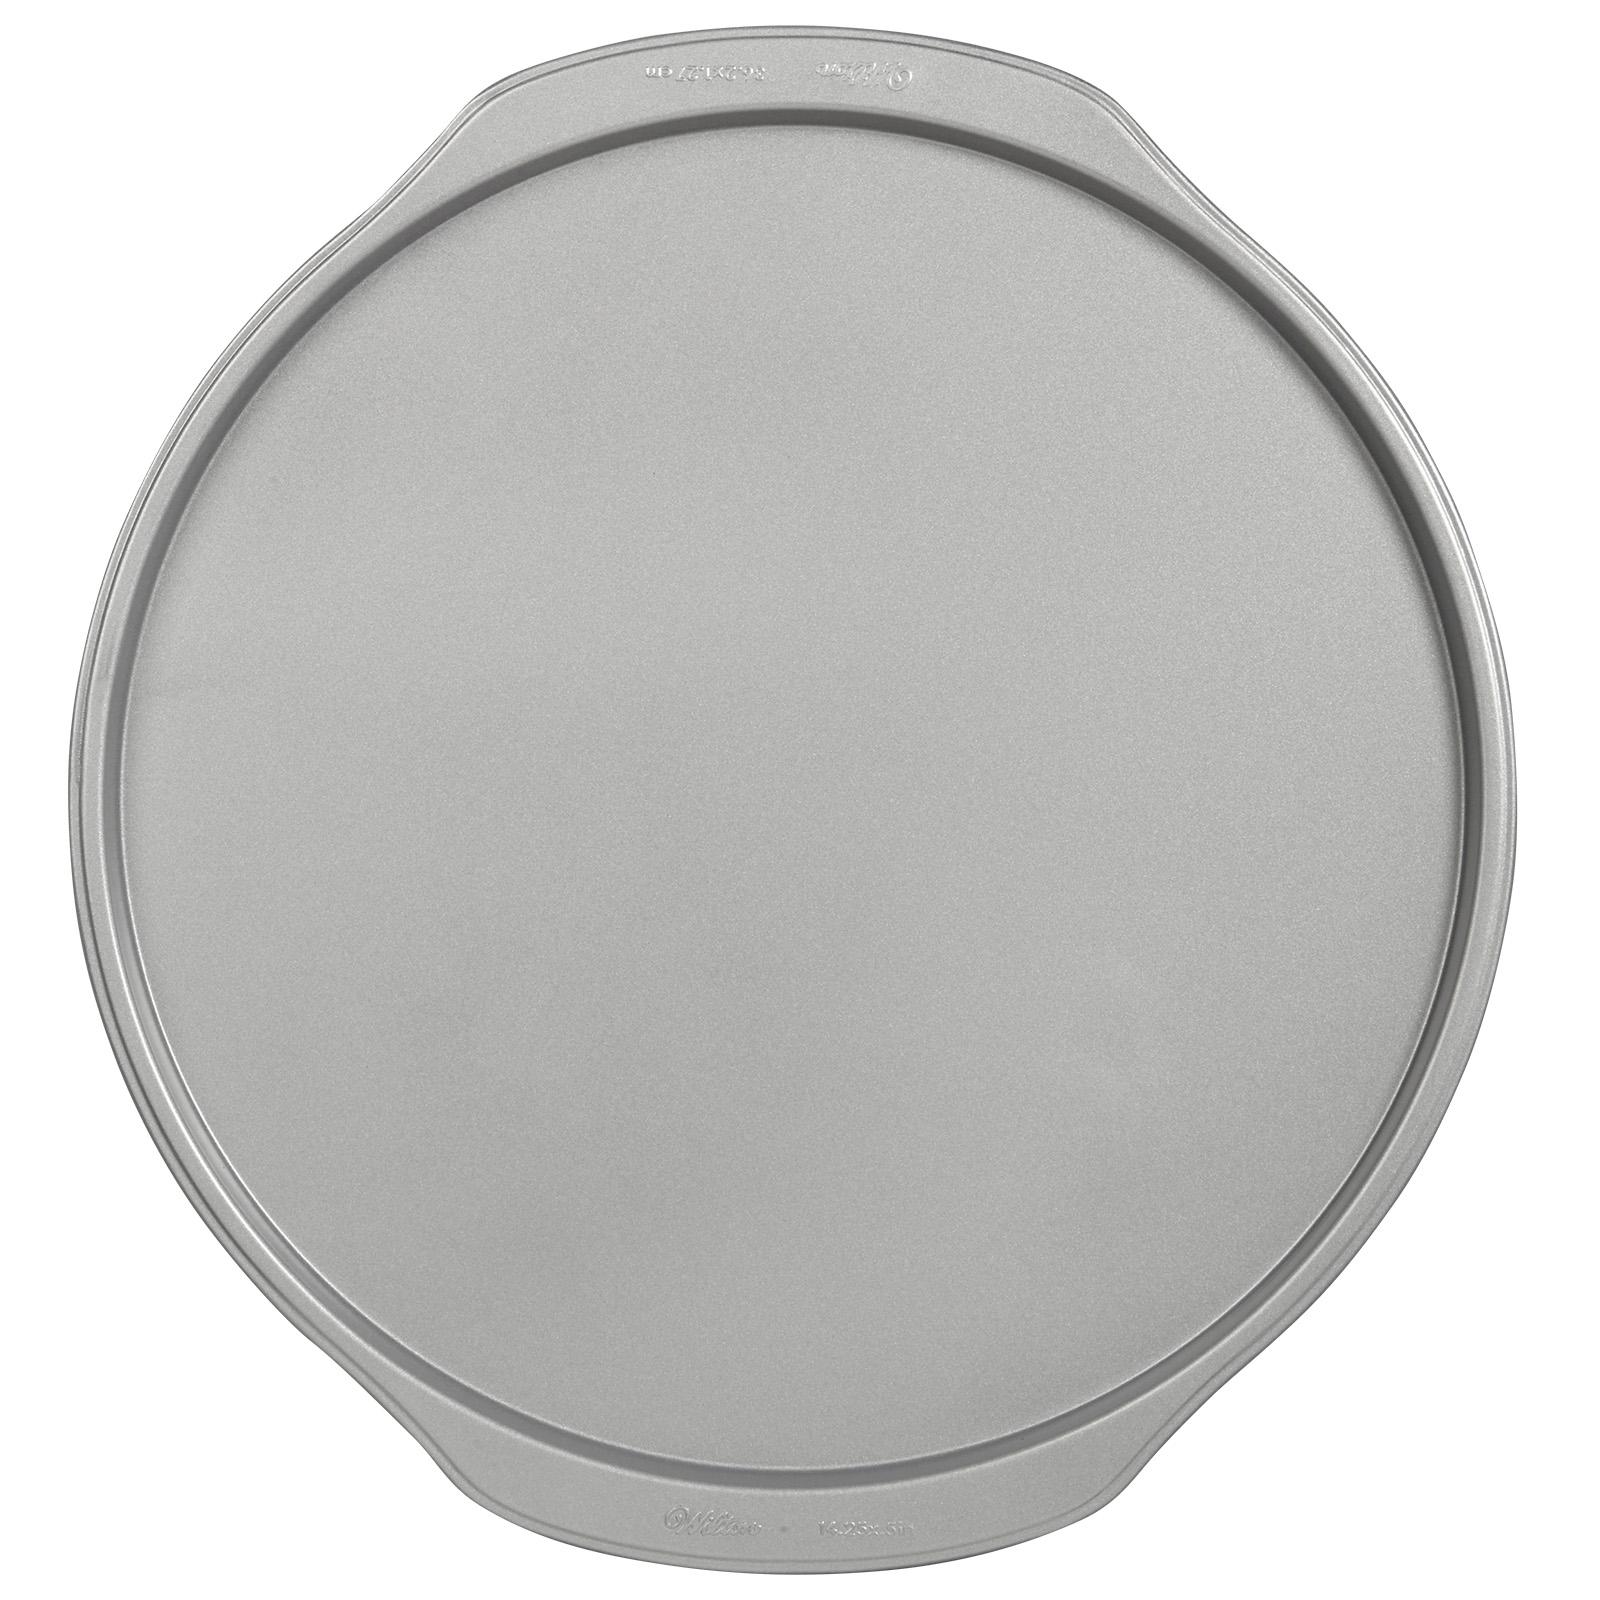 Wilton Baking Basics 14in Pizza Pan